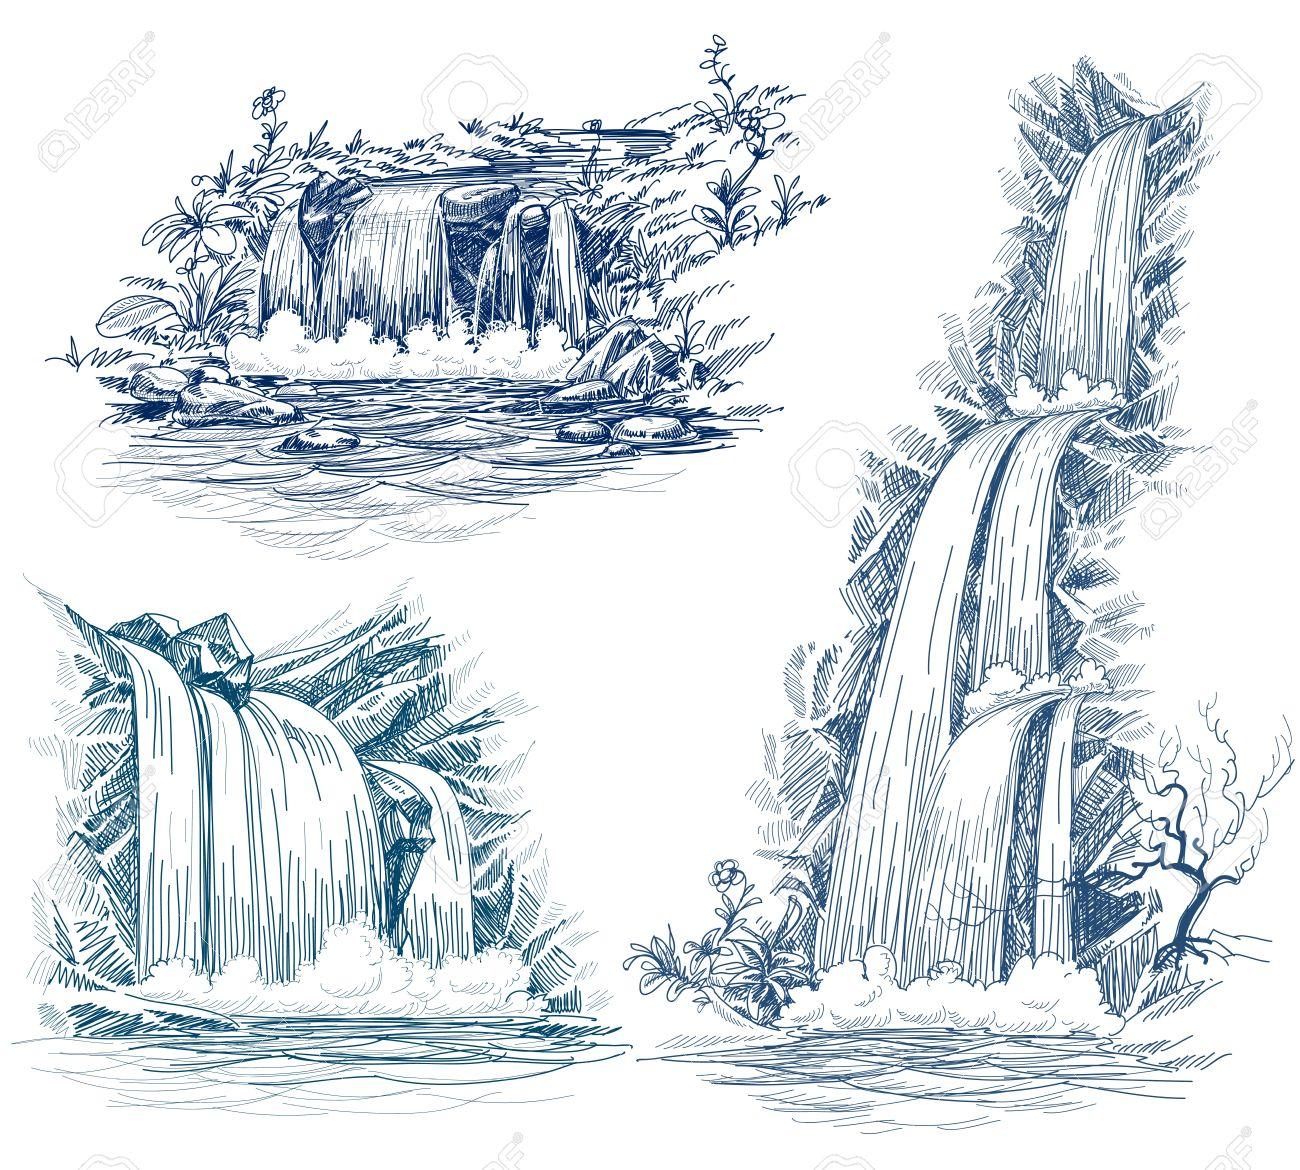 Water Falls Drawing Royalty Free Cliparts, Vectors, And Stock.